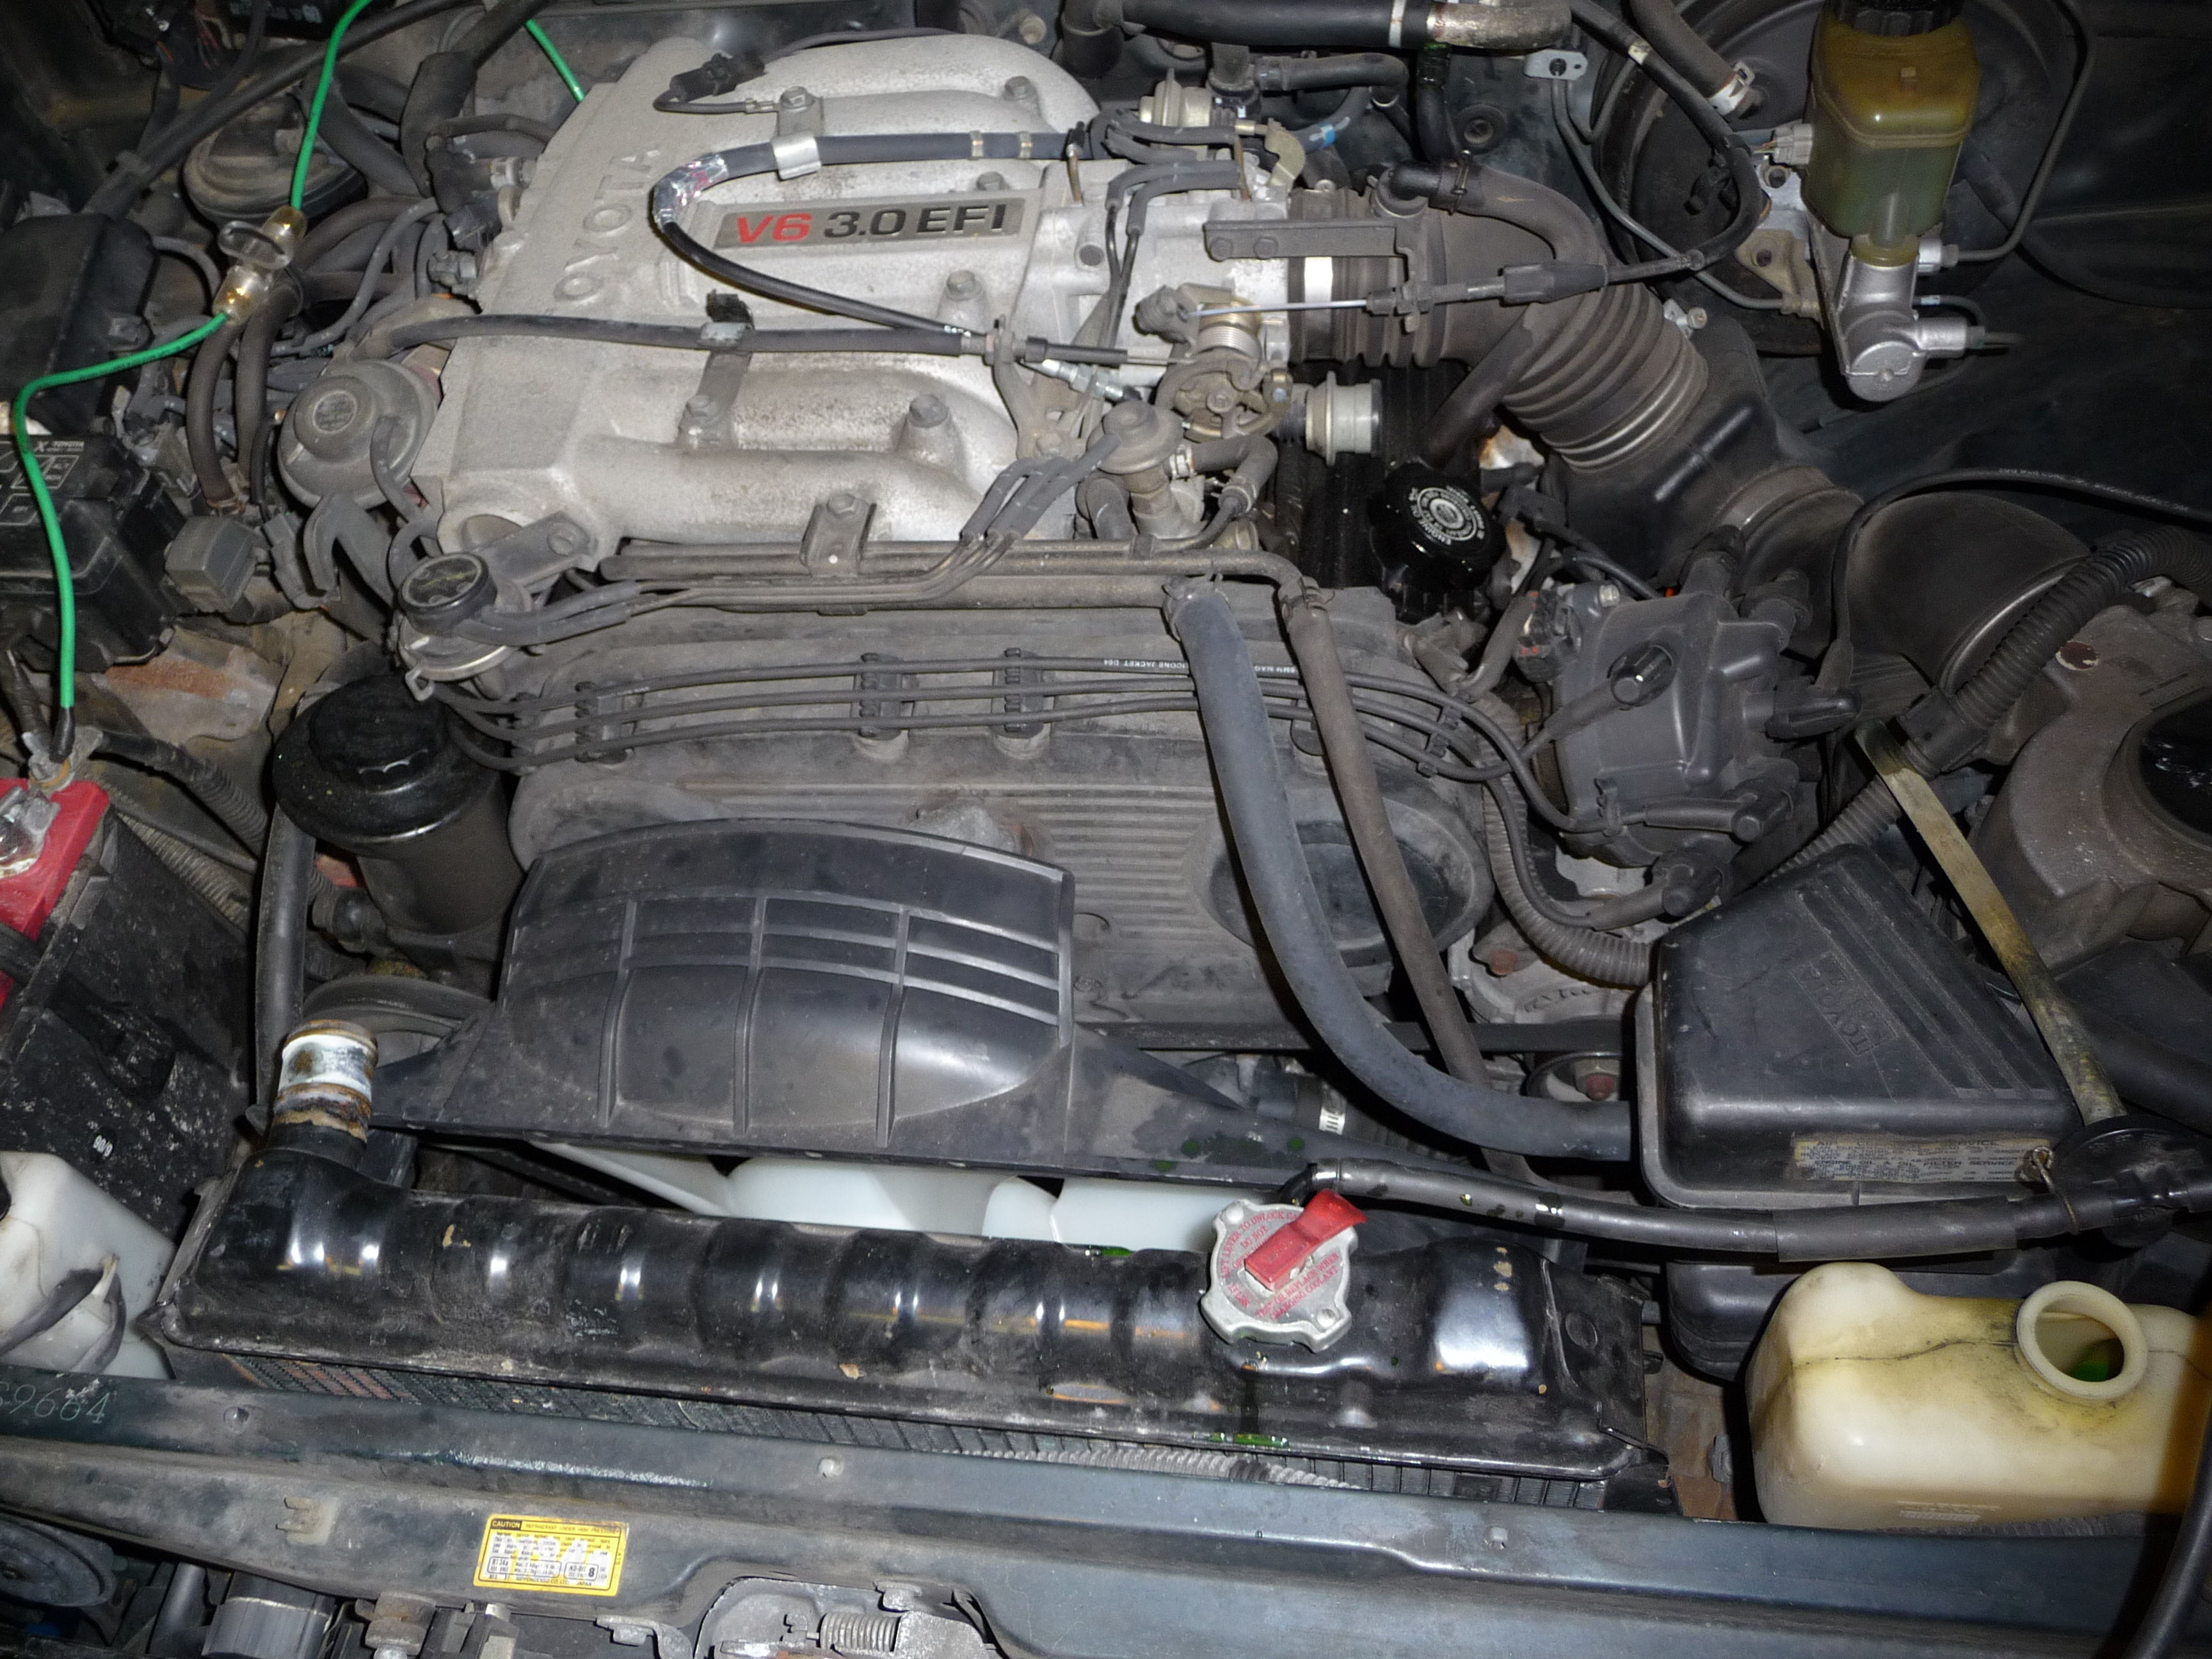 1995 toyota 4runner engine diagram fa 5713  1995 toyota v6 engine diagram schematic wiring  toyota v6 engine diagram schematic wiring